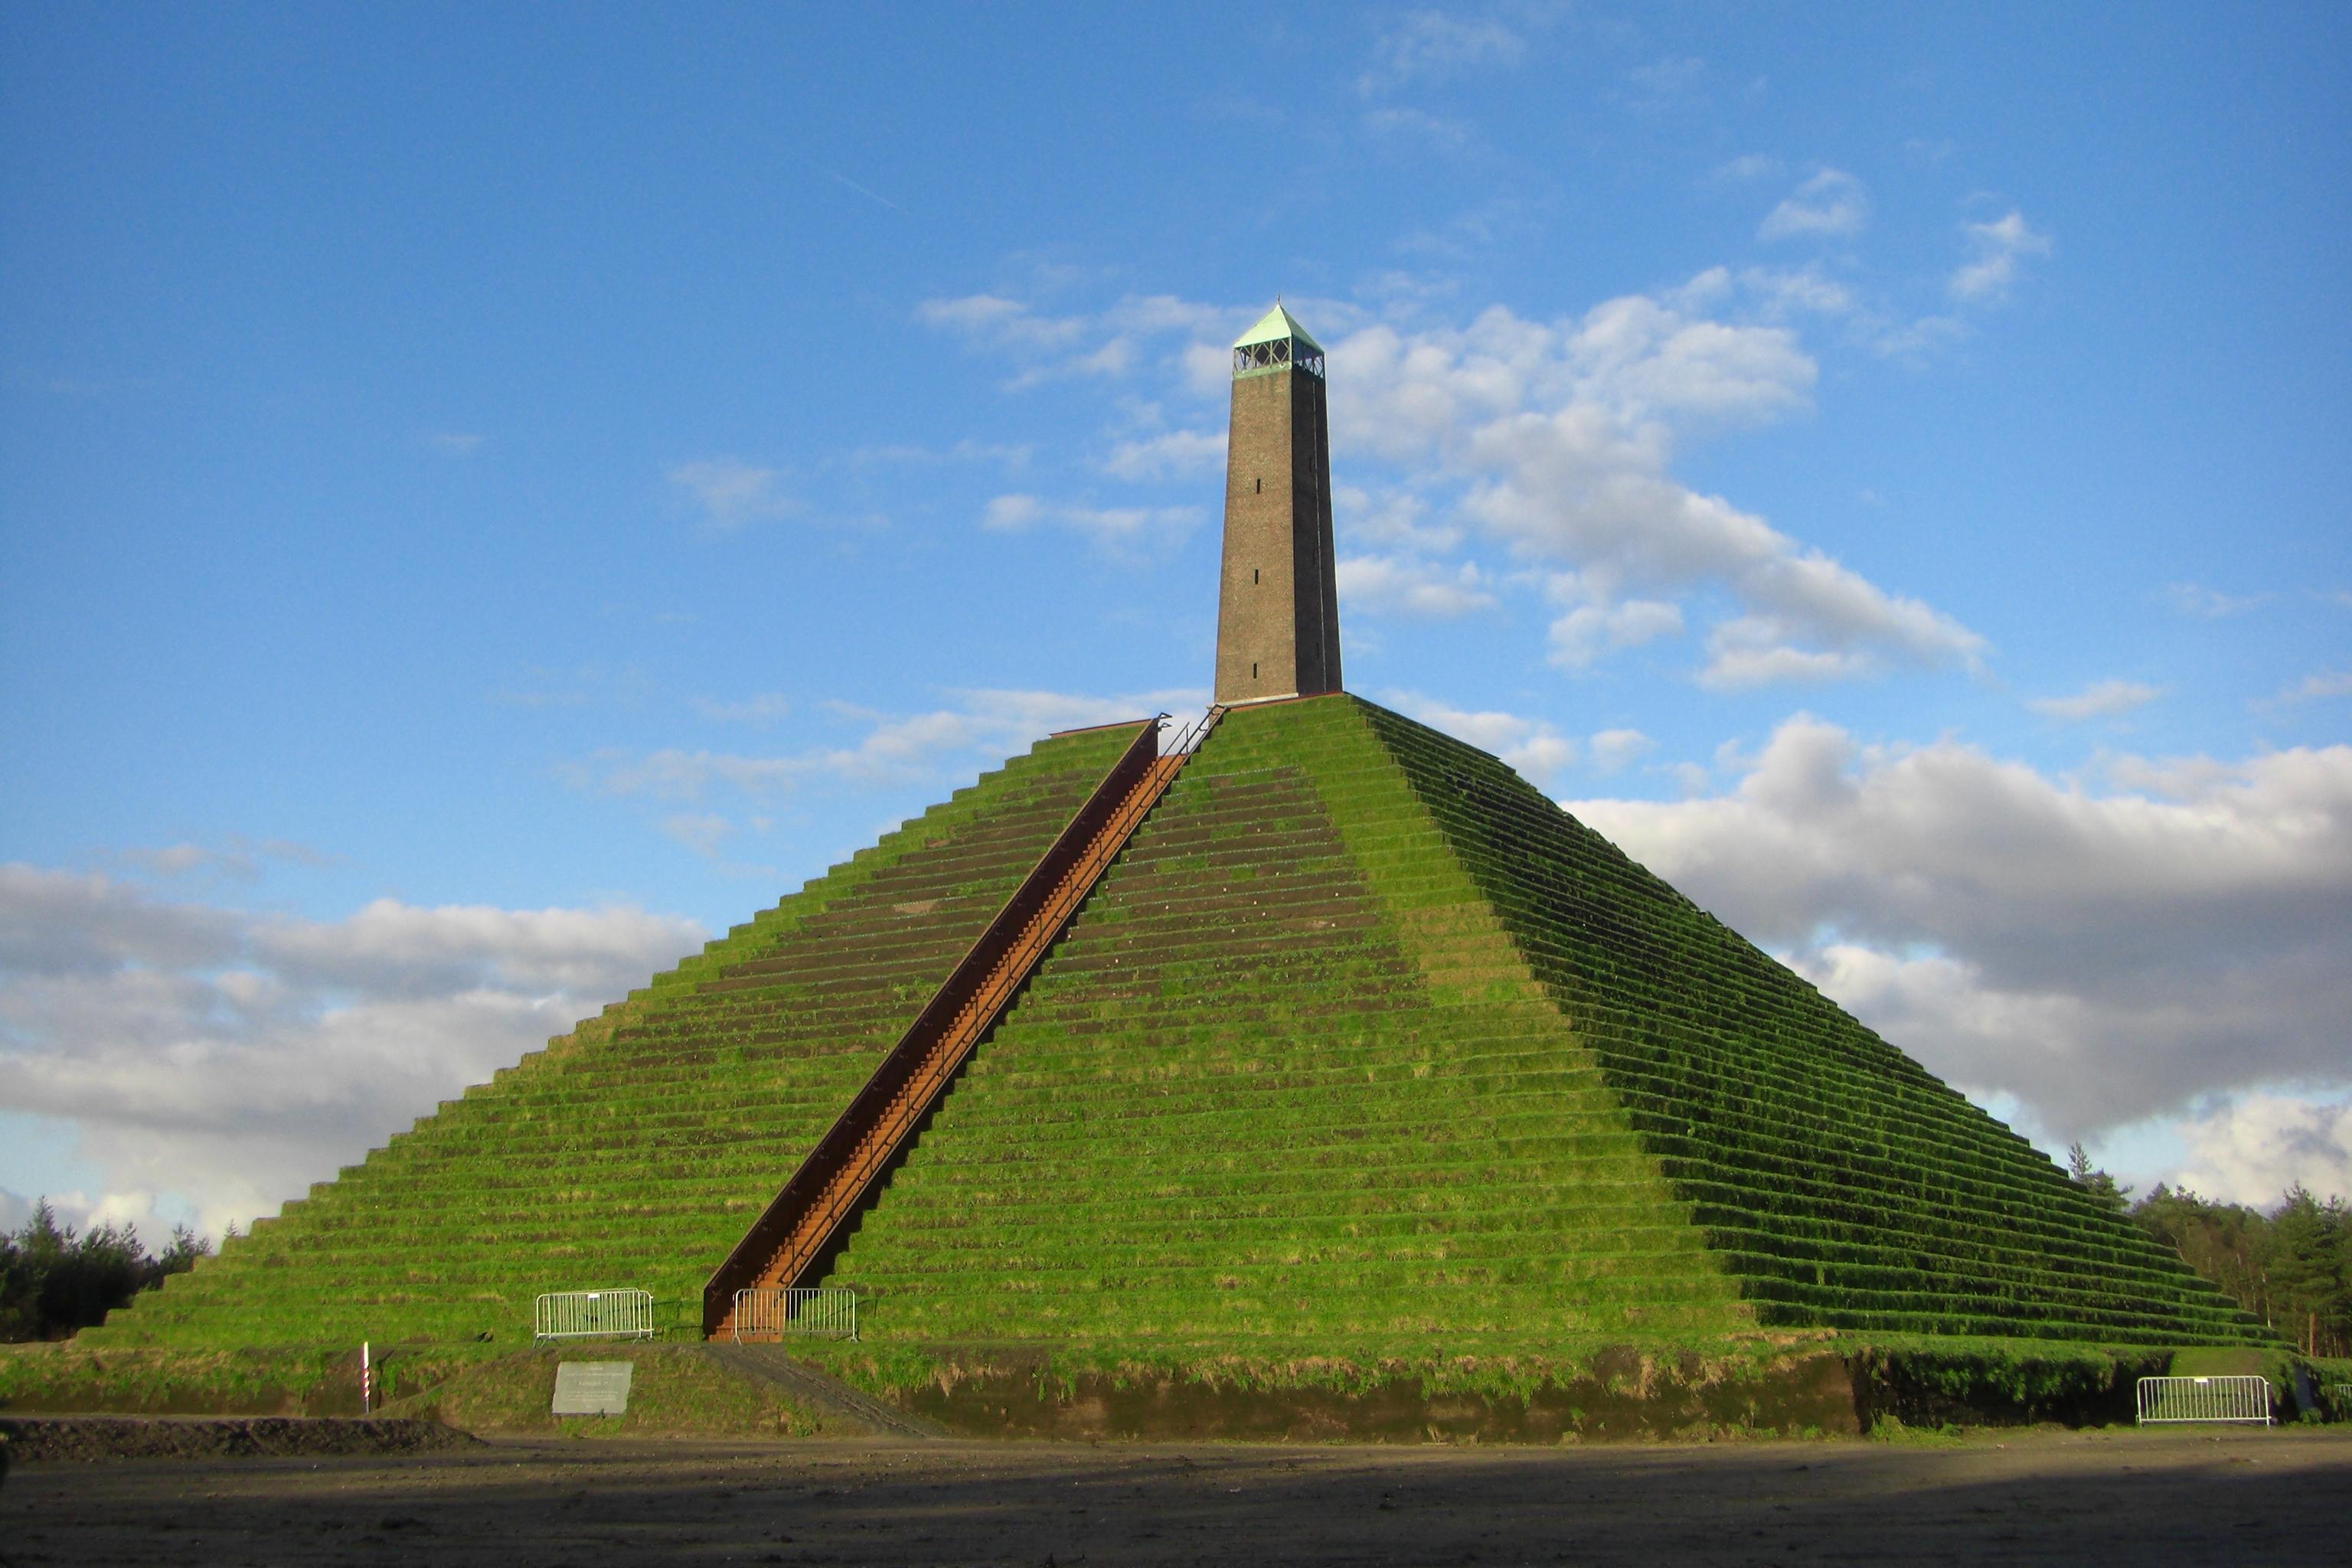 Pyramide van Austerlitz 2008